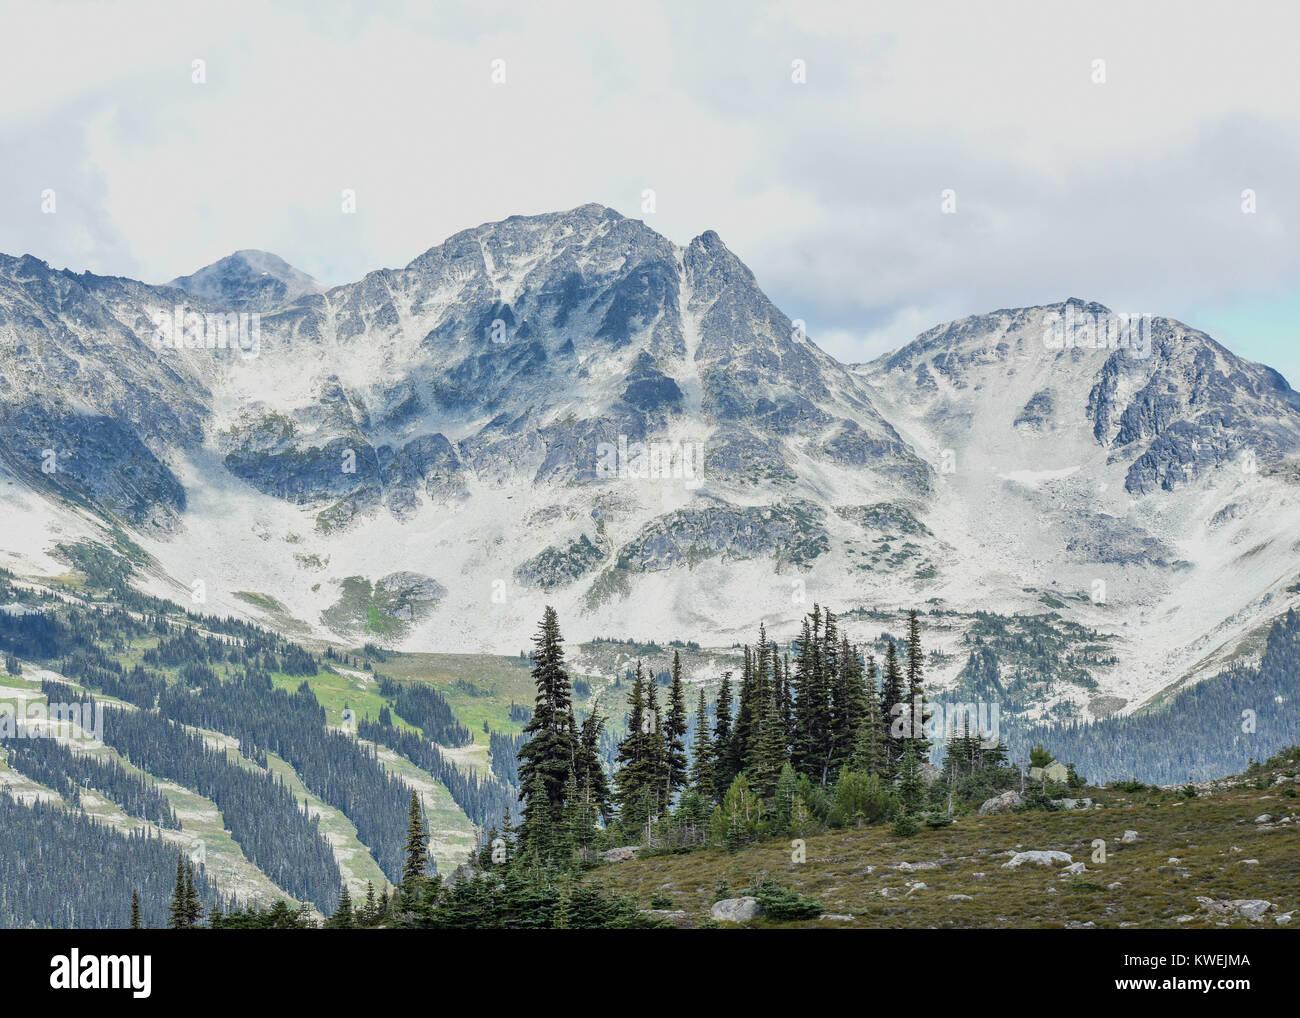 Summer on Whistler Blackcomb British Columbia Mountains fog & clouds enshroud the pine / fir trees and gondola - Stock Image